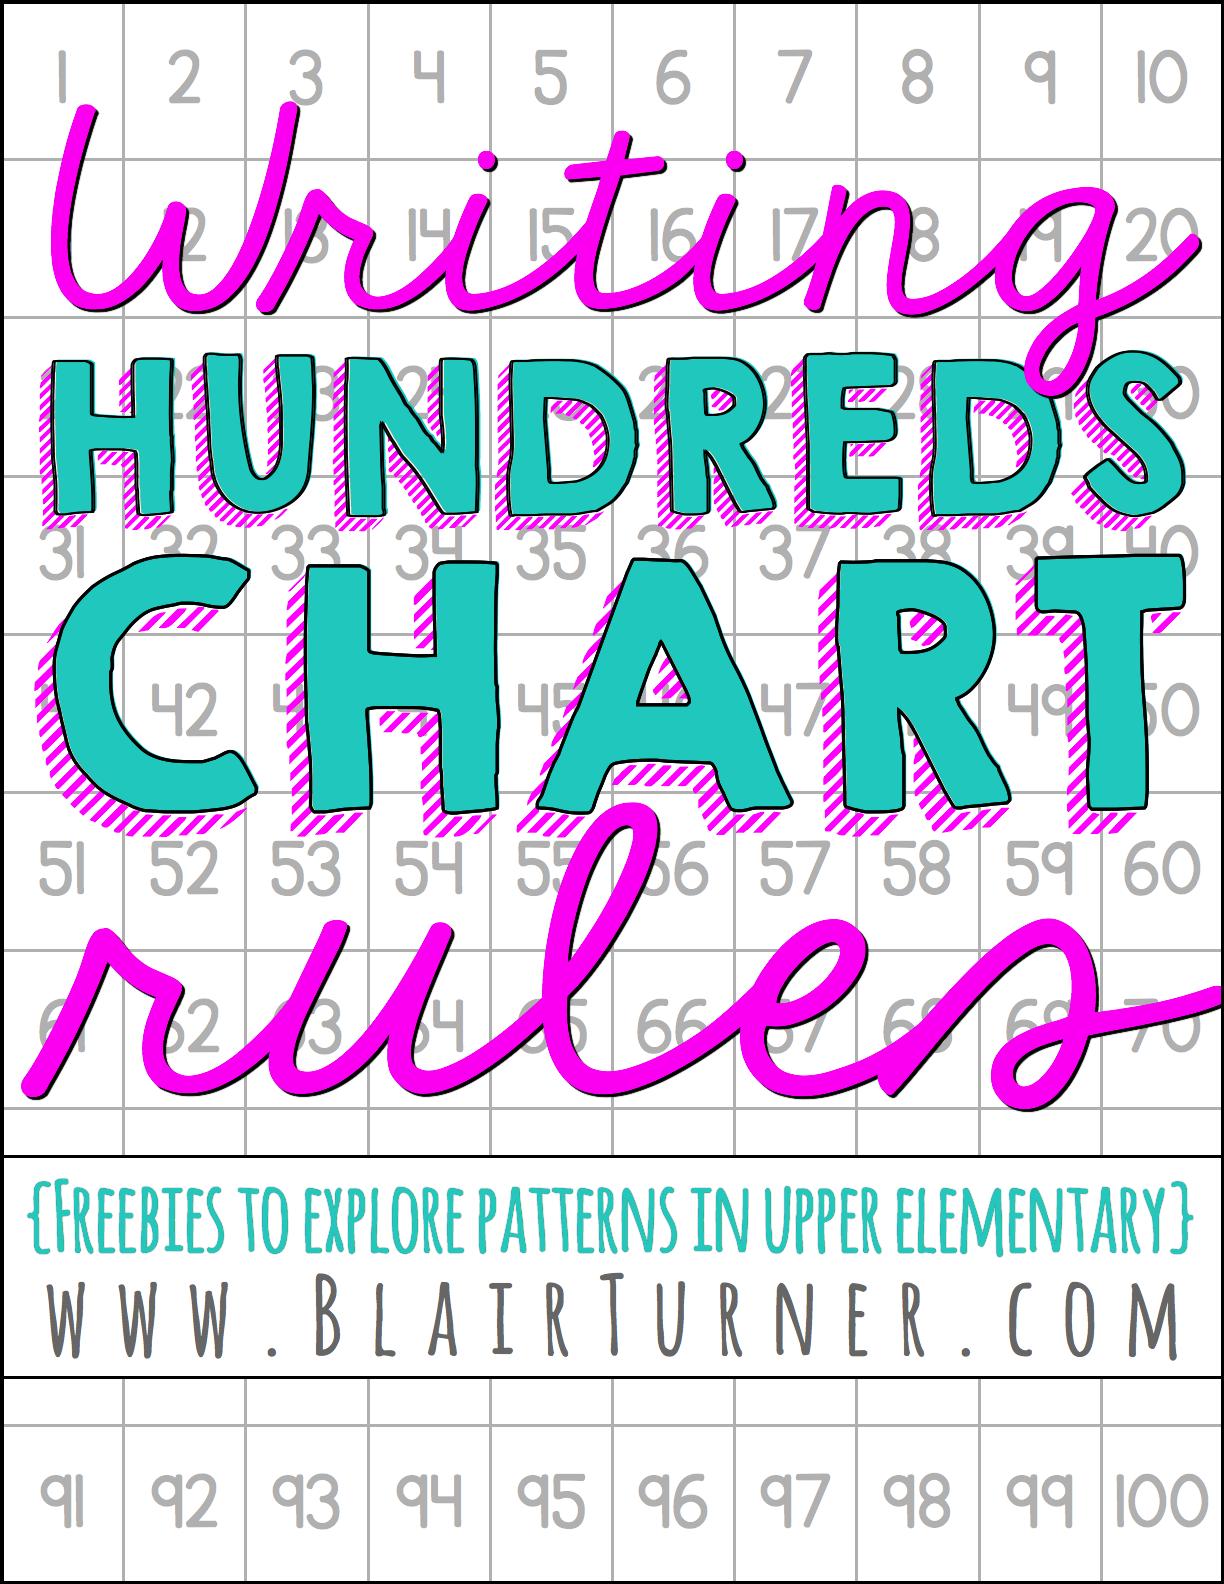 Hundreds Chart Rules {Freebie!} (BlairTurner.com) | Pinterest ...